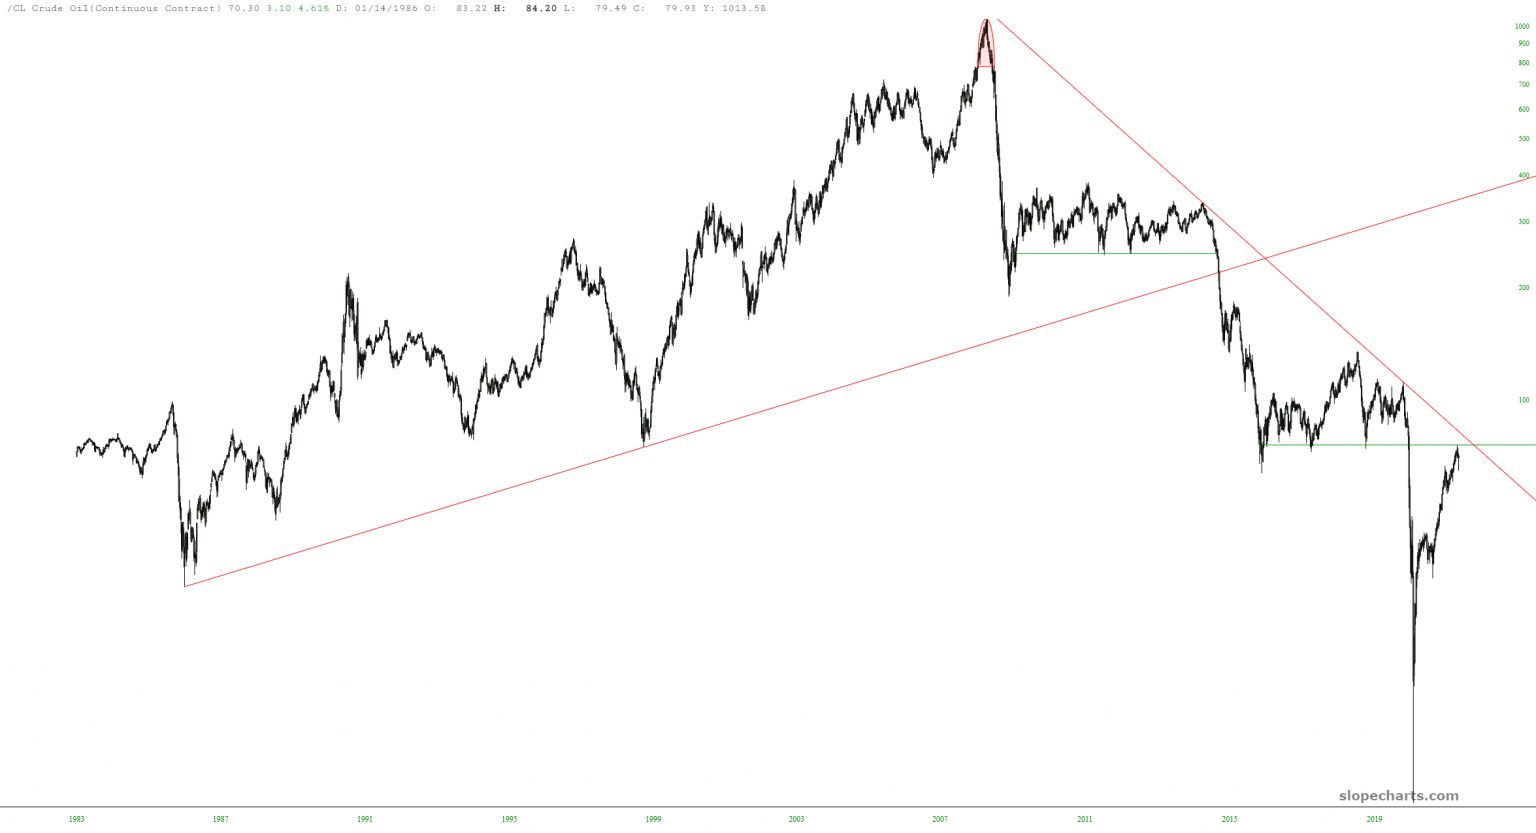 Crude Oil Futures Chart.